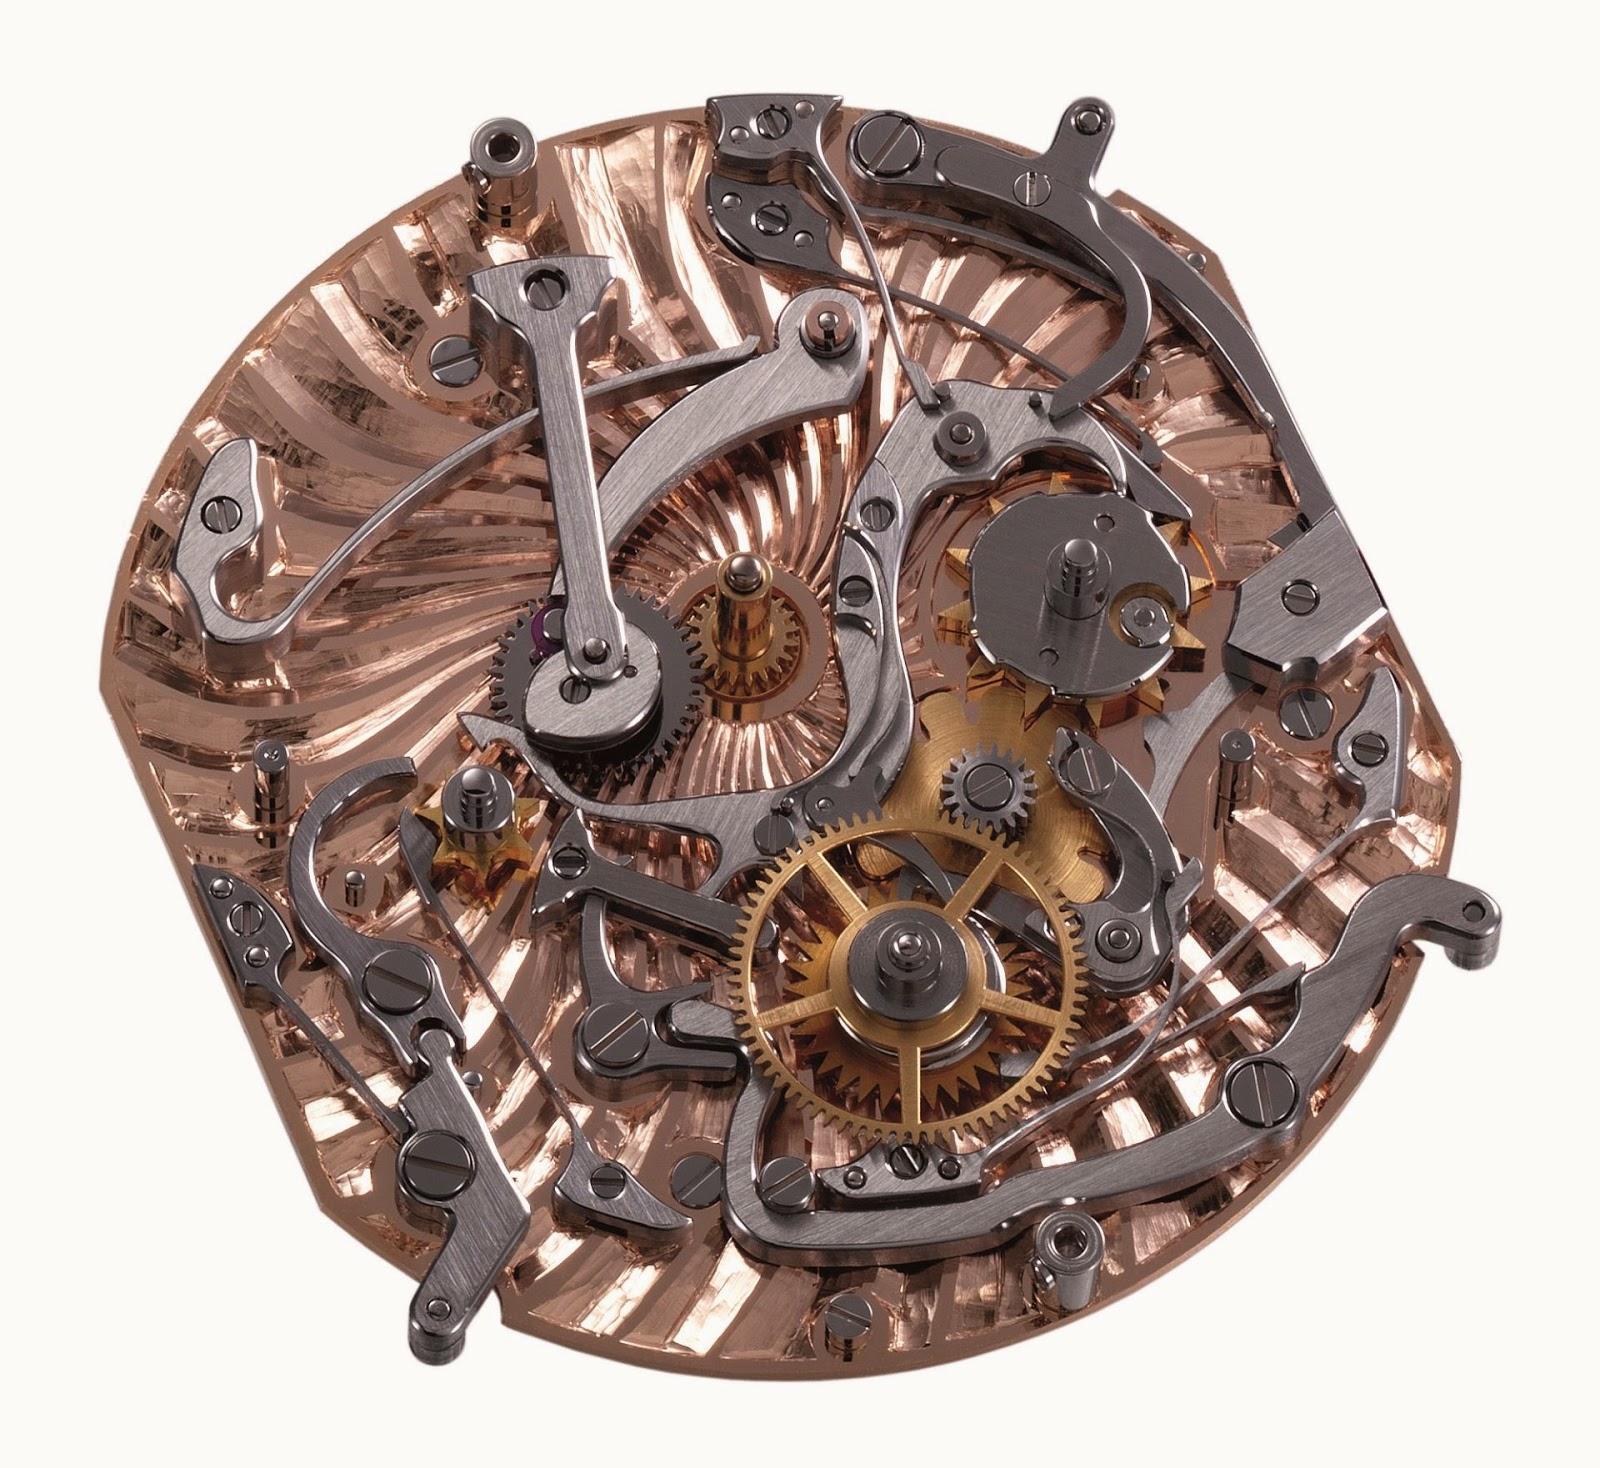 Daniel Roth Quantième Perpétuel Instantané (Instant Perpetual Calendar) in Platinum Calibre DR 114 self winding movement